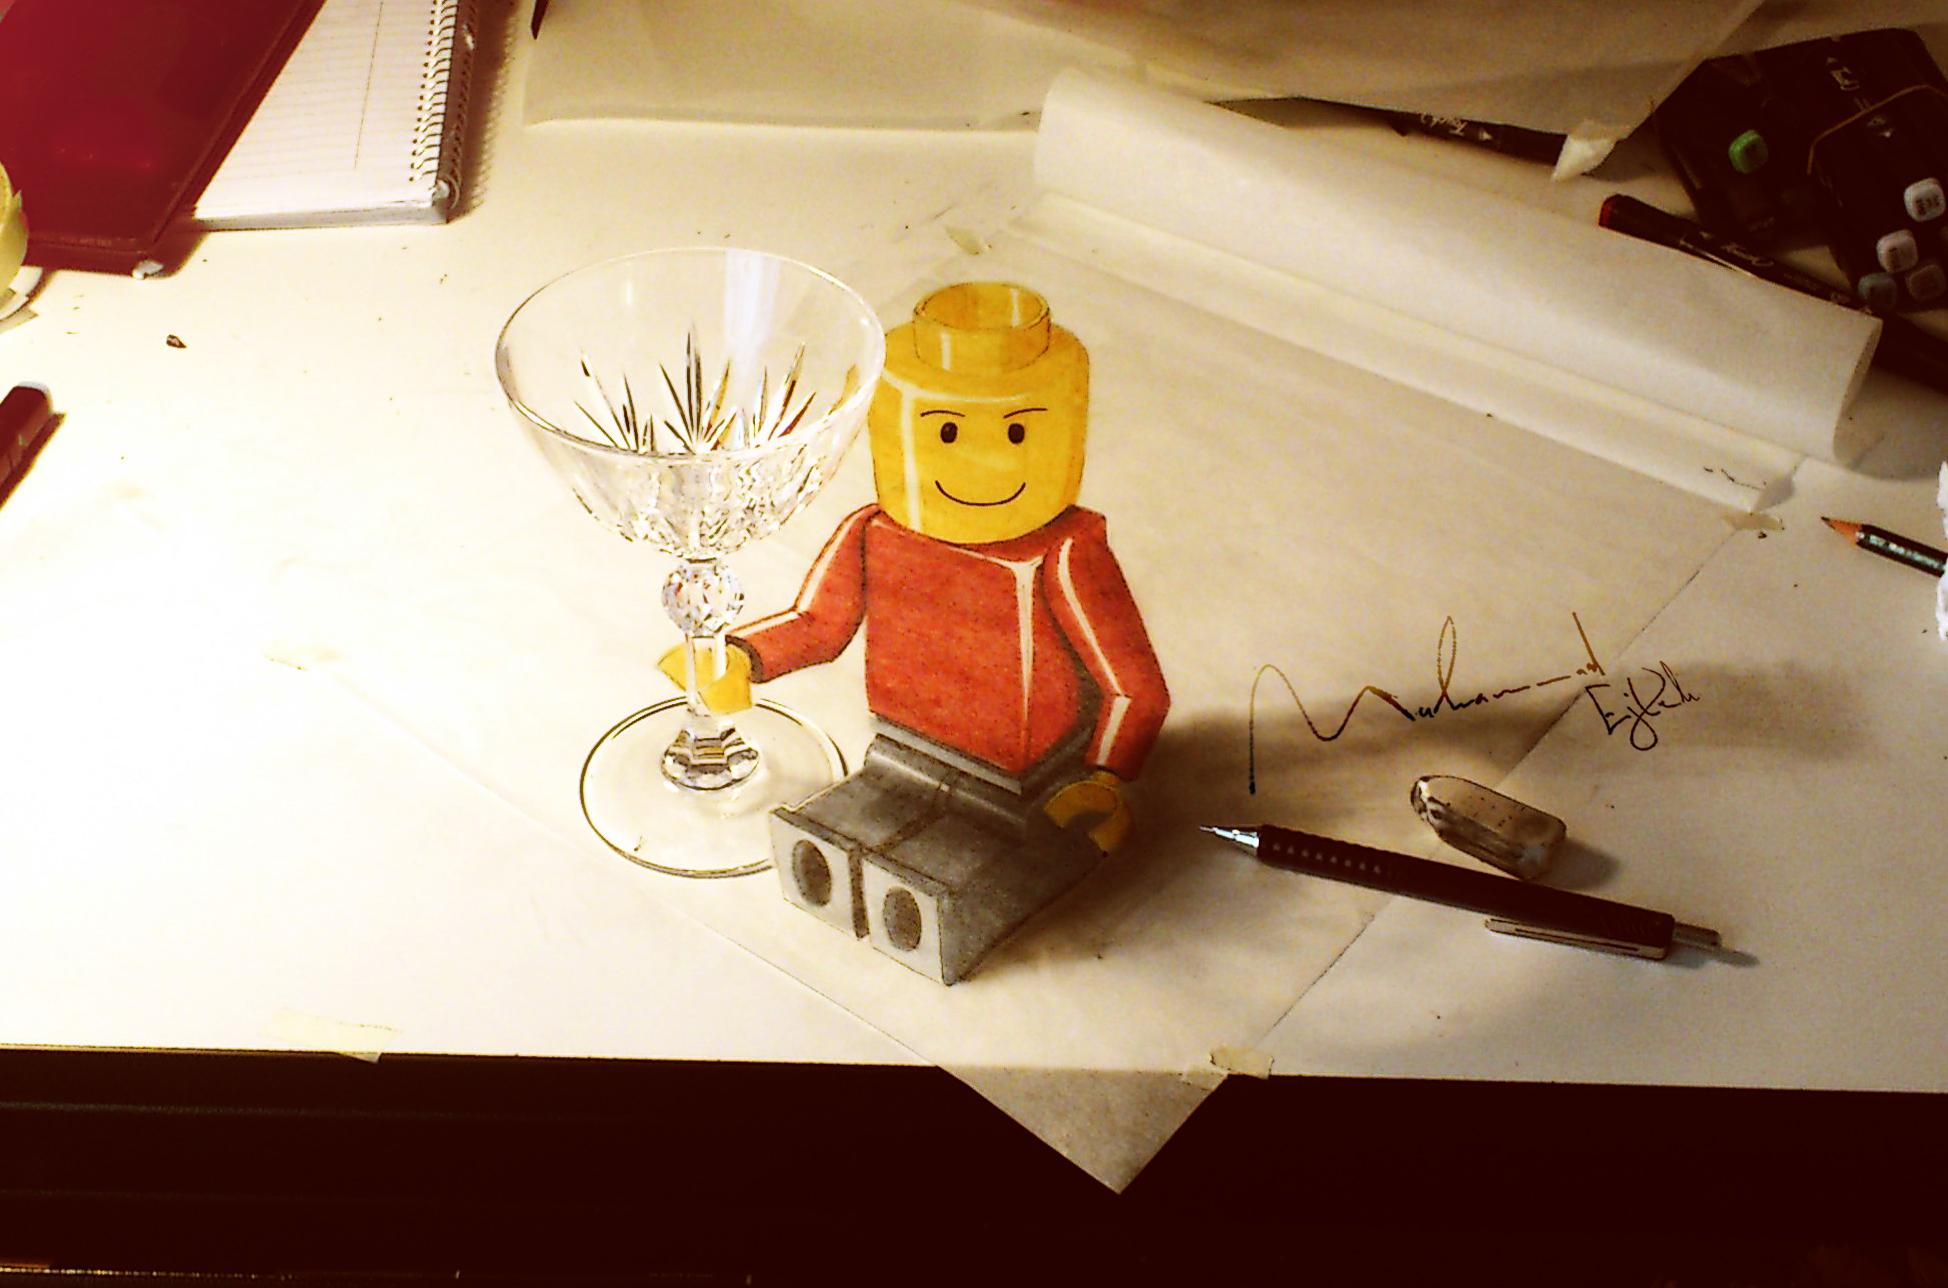 LEGO man by Muhammad-Ejleh